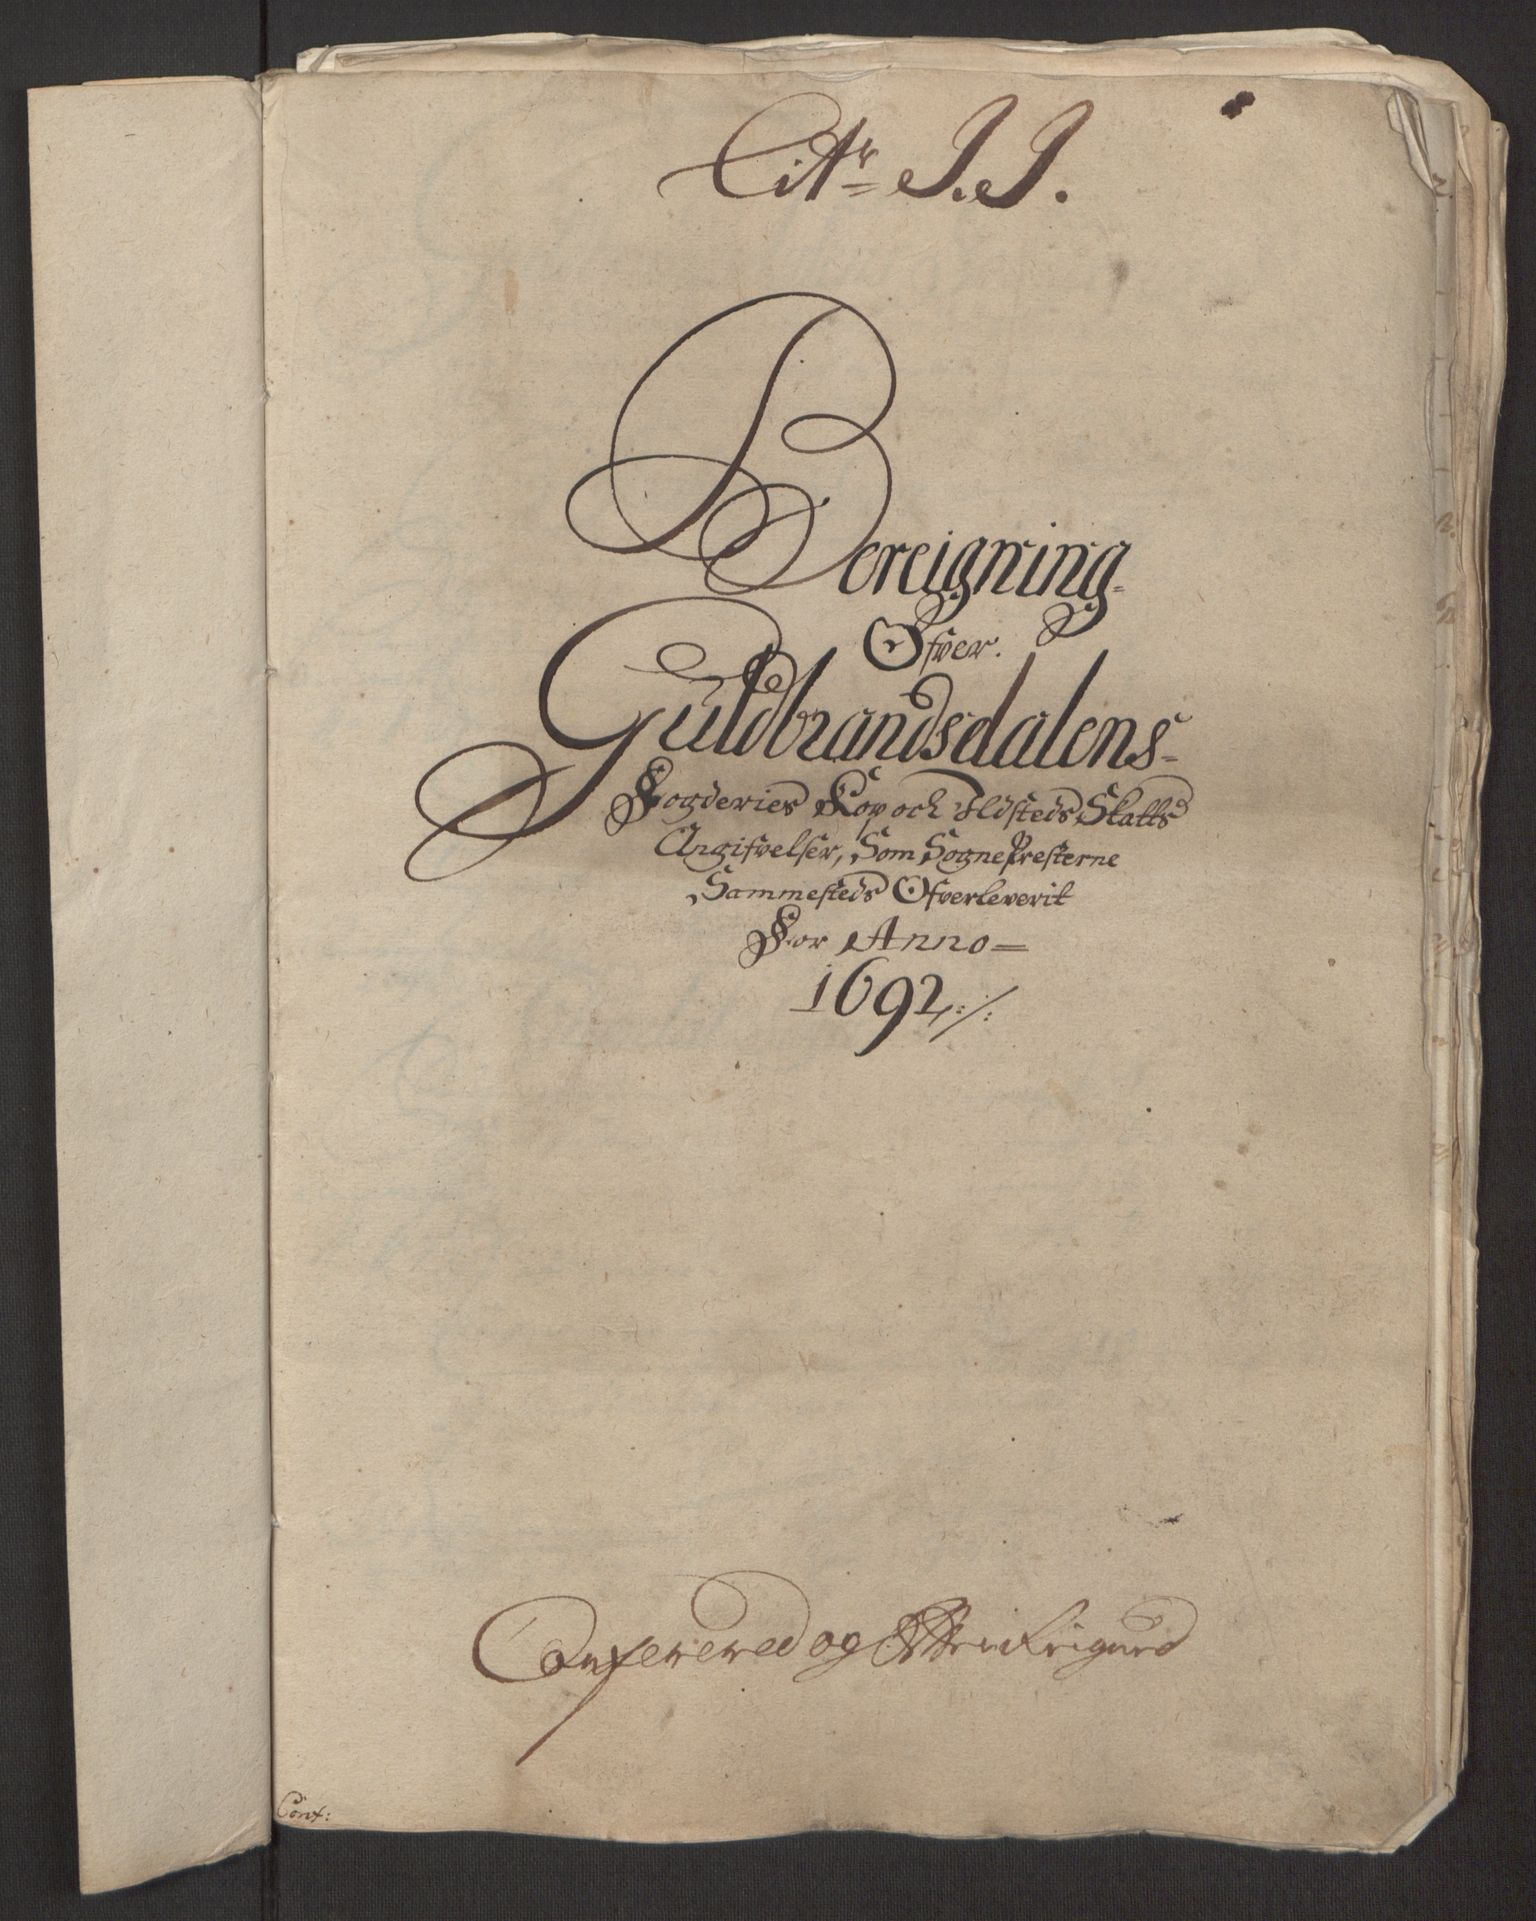 RA, Rentekammeret inntil 1814, Reviderte regnskaper, Fogderegnskap, R17/L1166: Fogderegnskap Gudbrandsdal, 1690-1692, s. 131